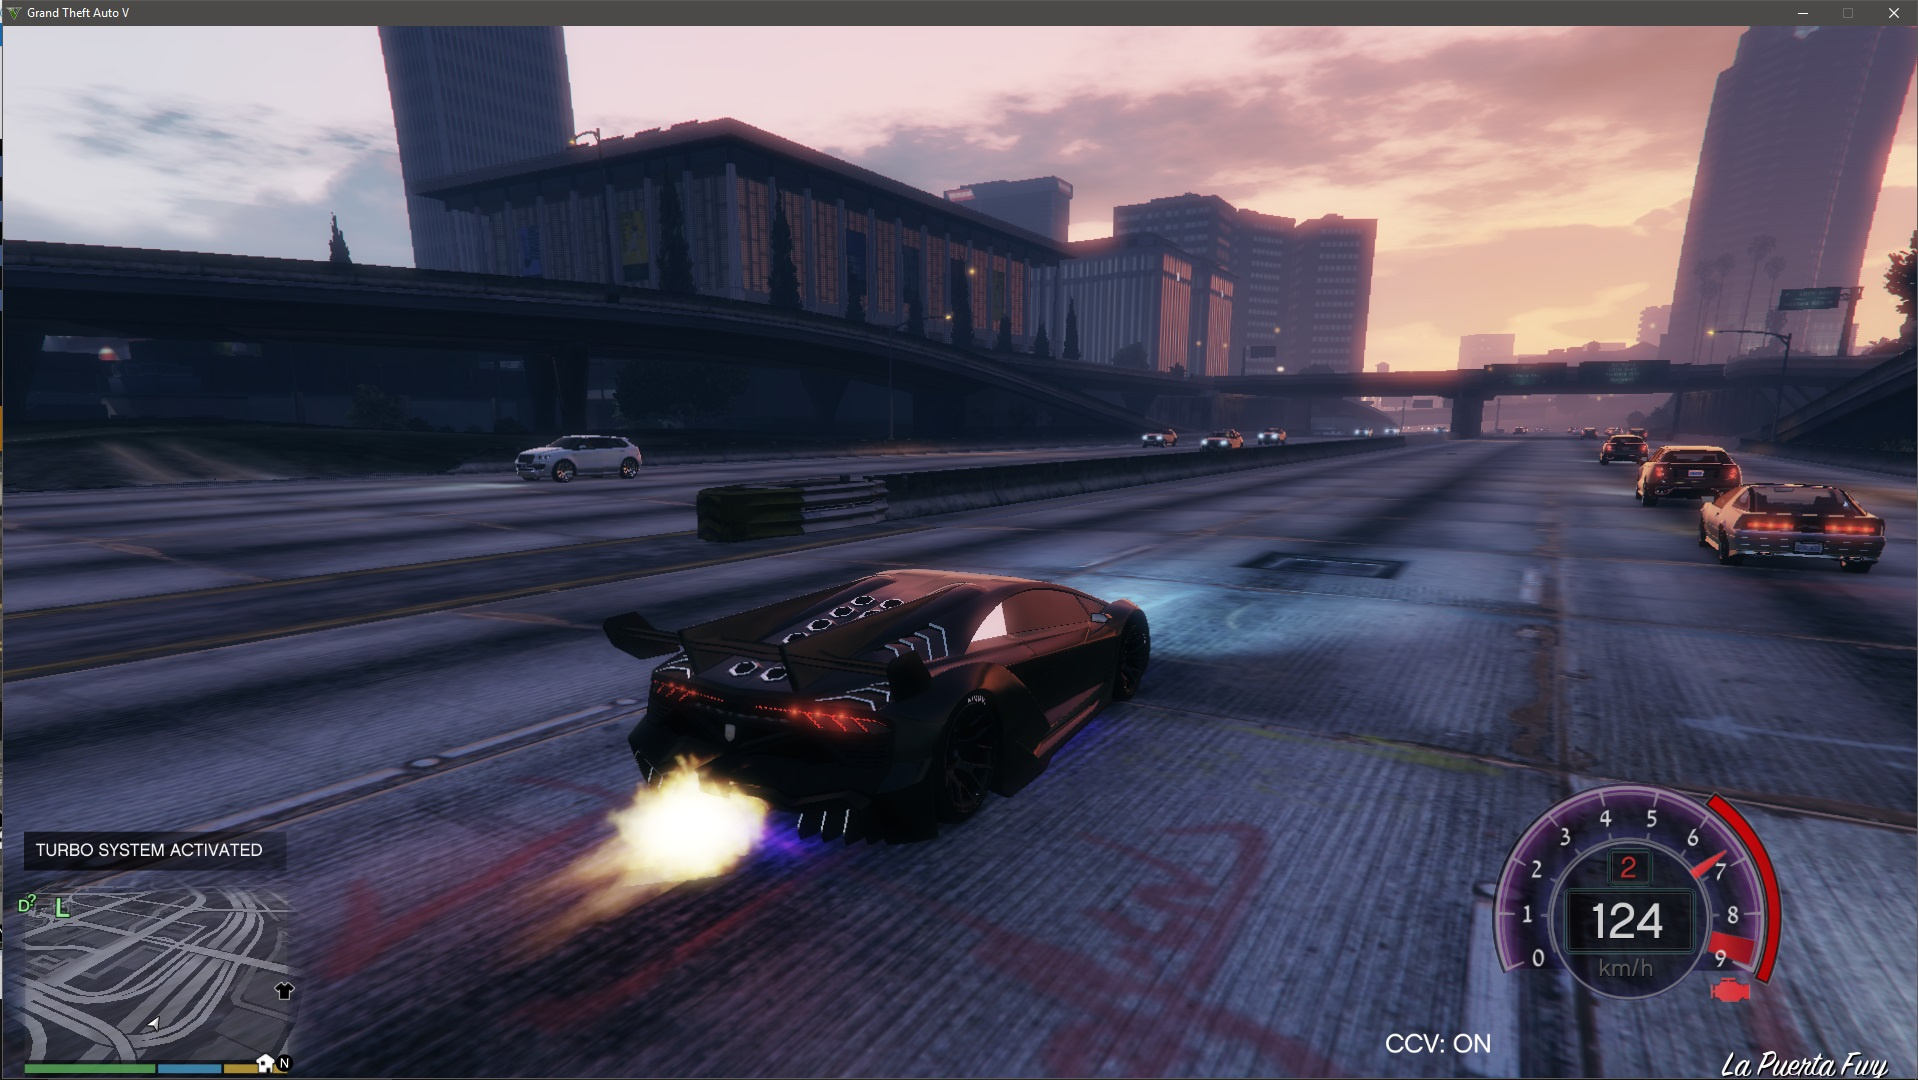 TurboSystemV (Ultra Nitro) - GTA5-Mods com